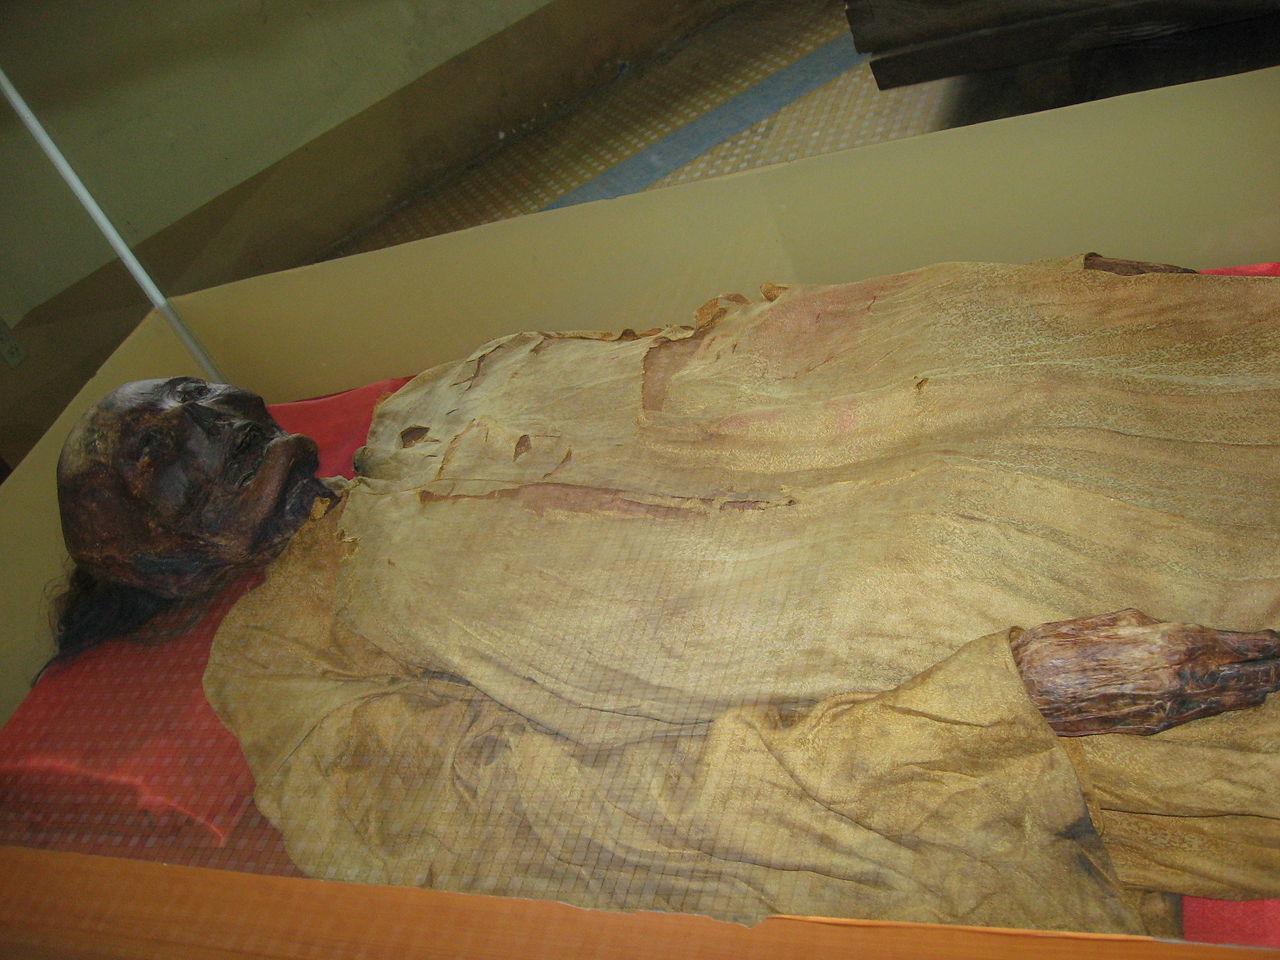 Saigon Zoo guide - the mummy Lady